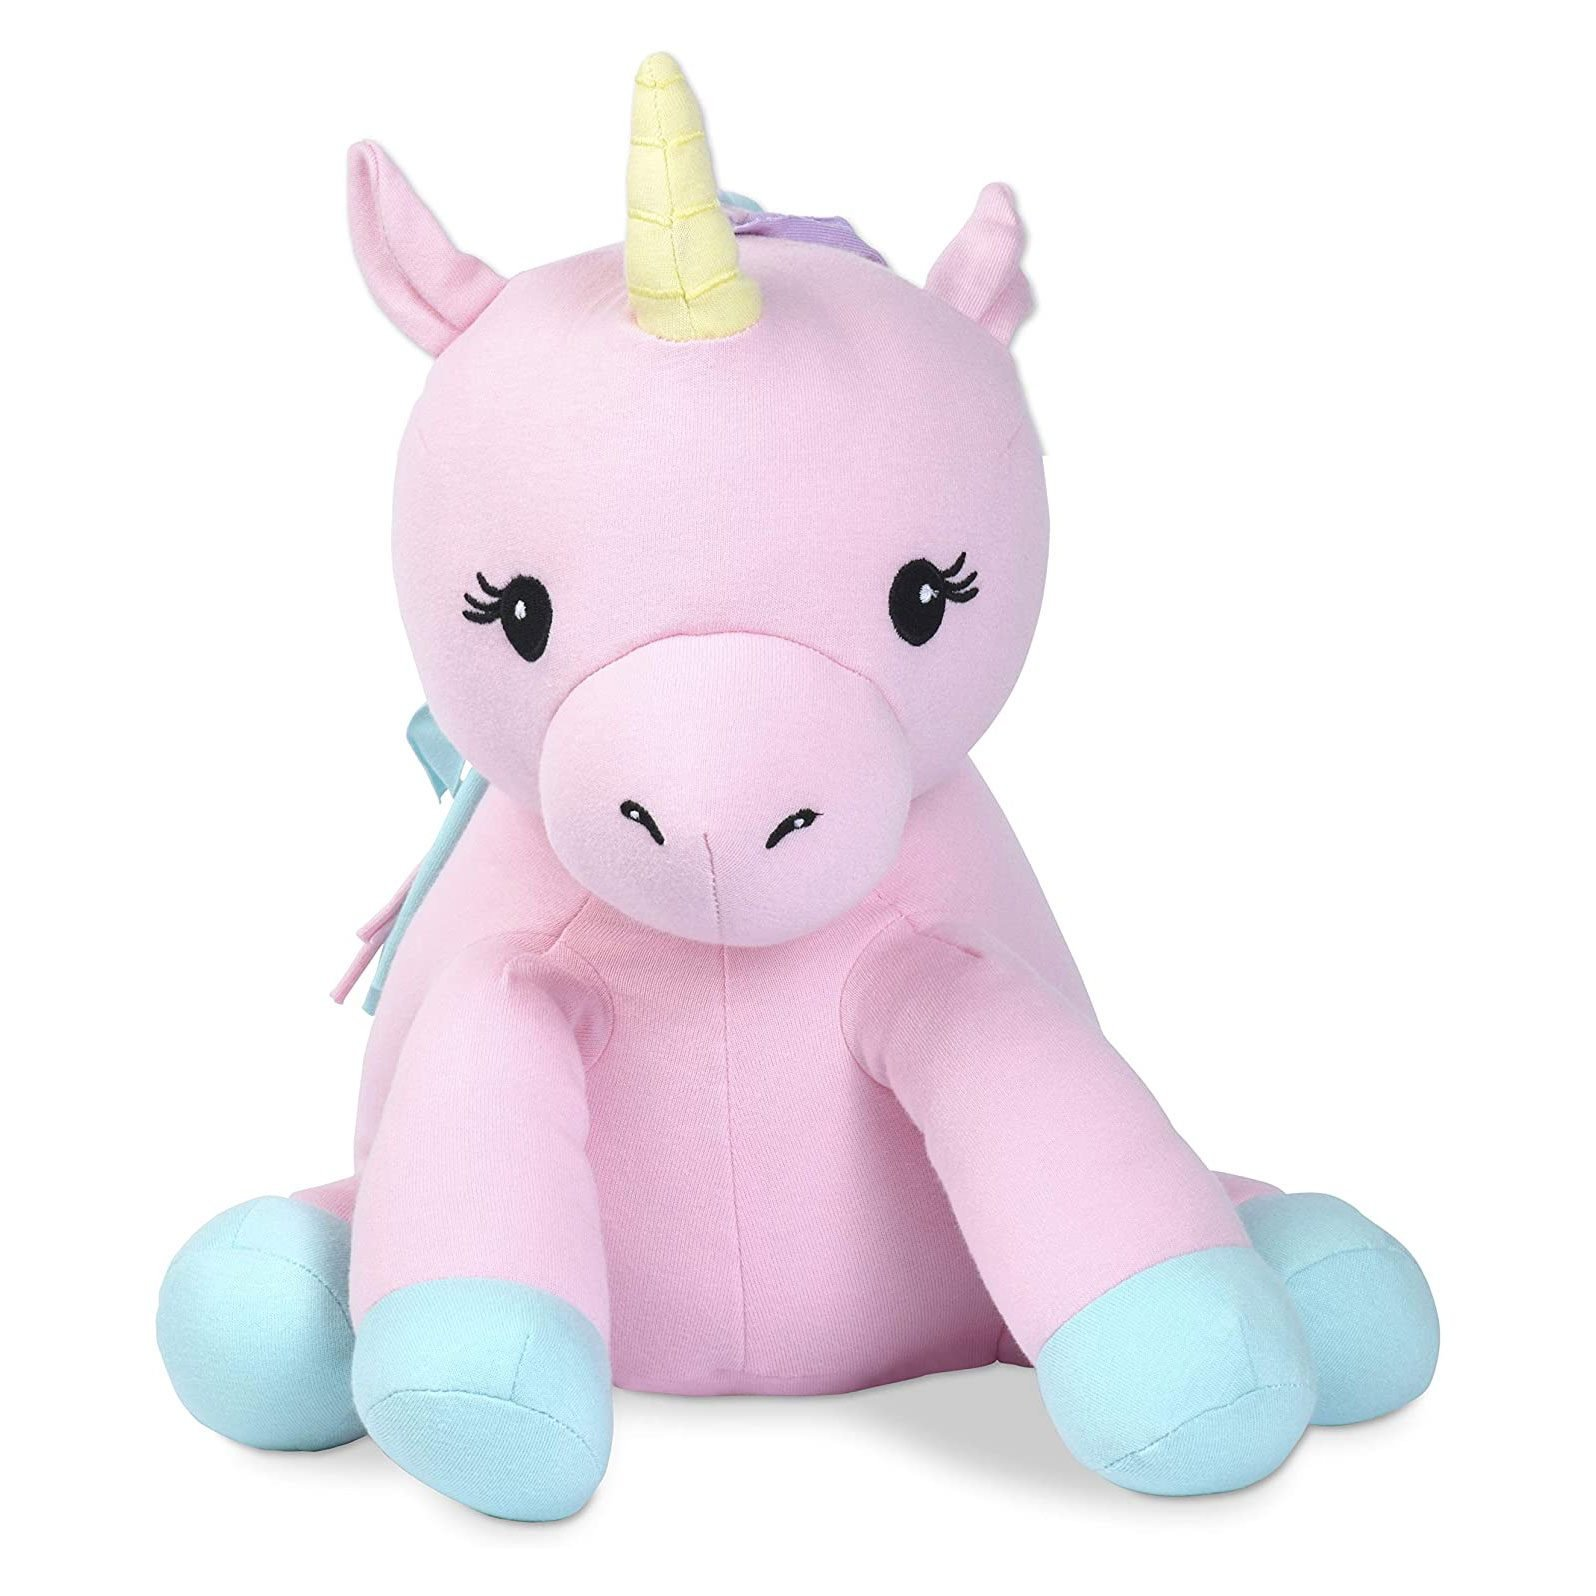 Elly Lu Cupcake The Unicorn